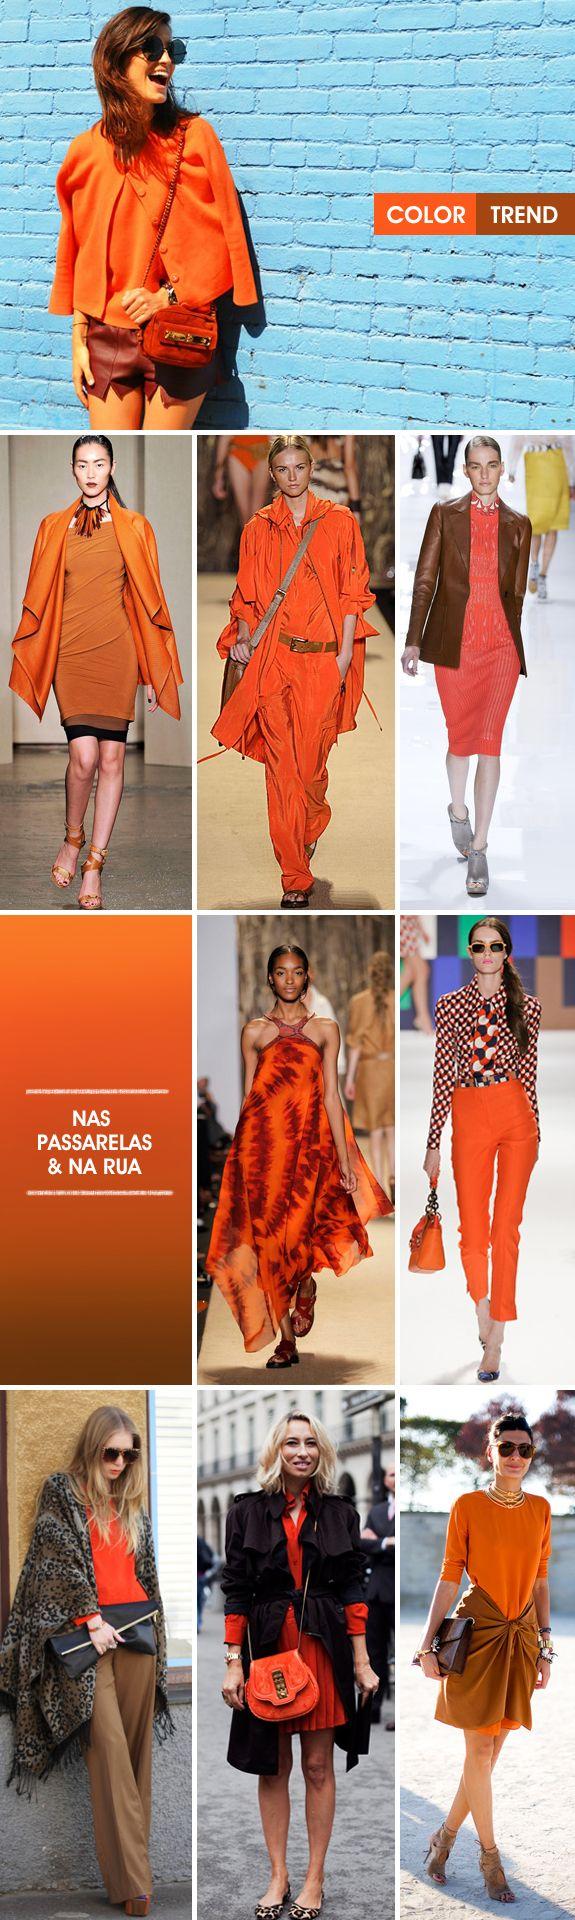 Color trend: laranja + marrom